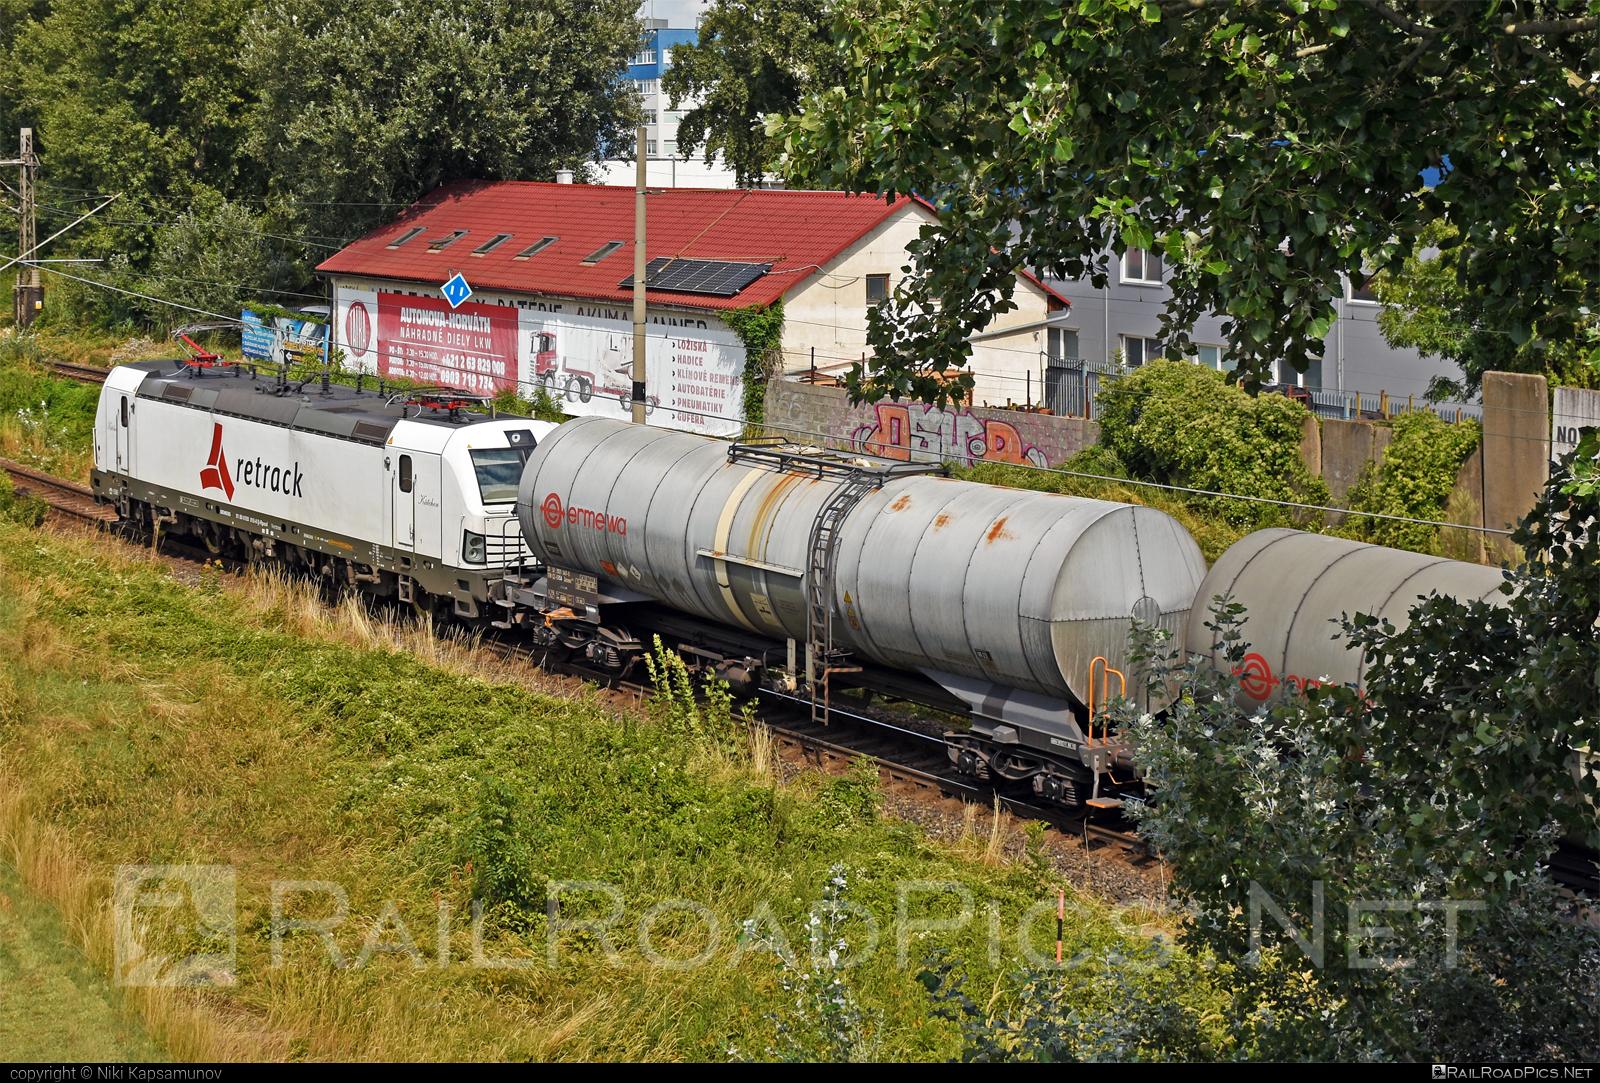 Siemens Vectron AC - 193 815 operated by Retrack GmbH & Co. KG #ermewa #kesselwagen #railpool #railpoolgmbh #retrack #retrackgmbh #siemens #siemensvectron #siemensvectronac #tankwagon #vectron #vectronac